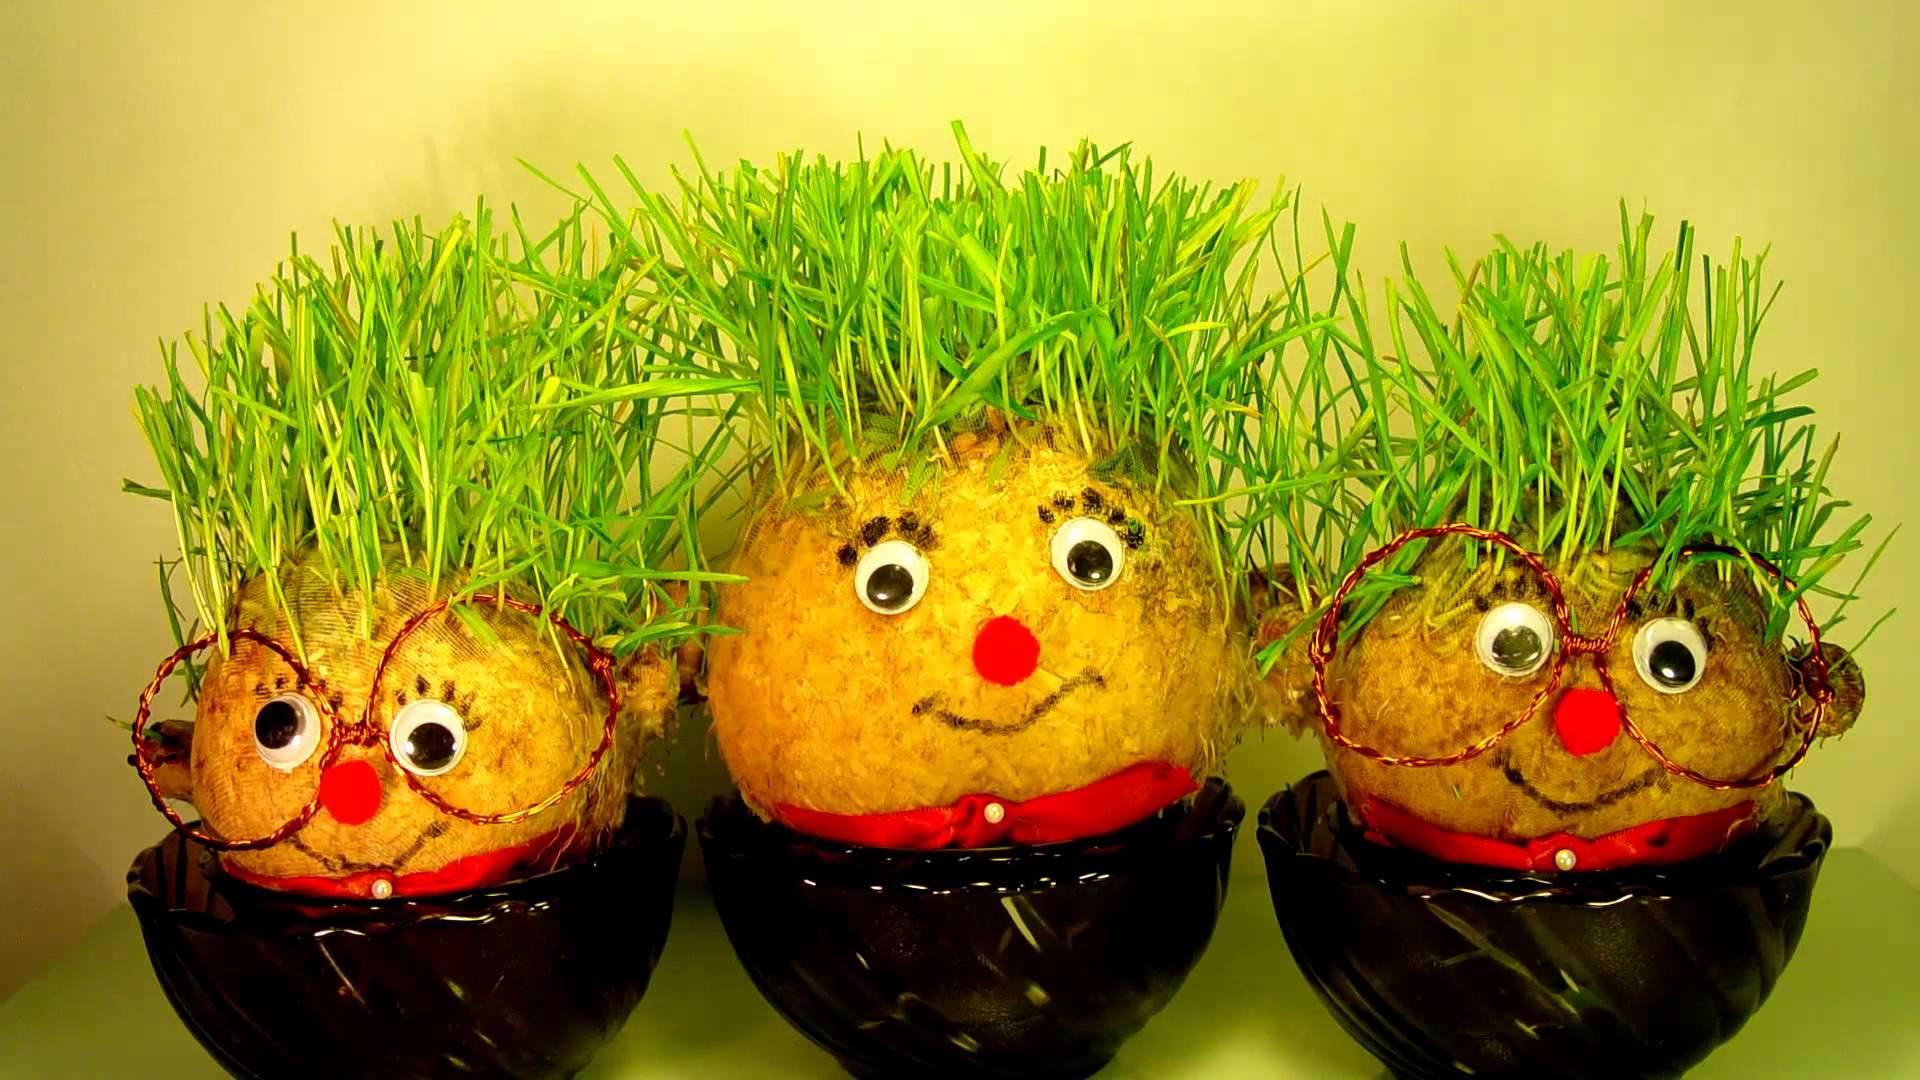 Potato grass photo